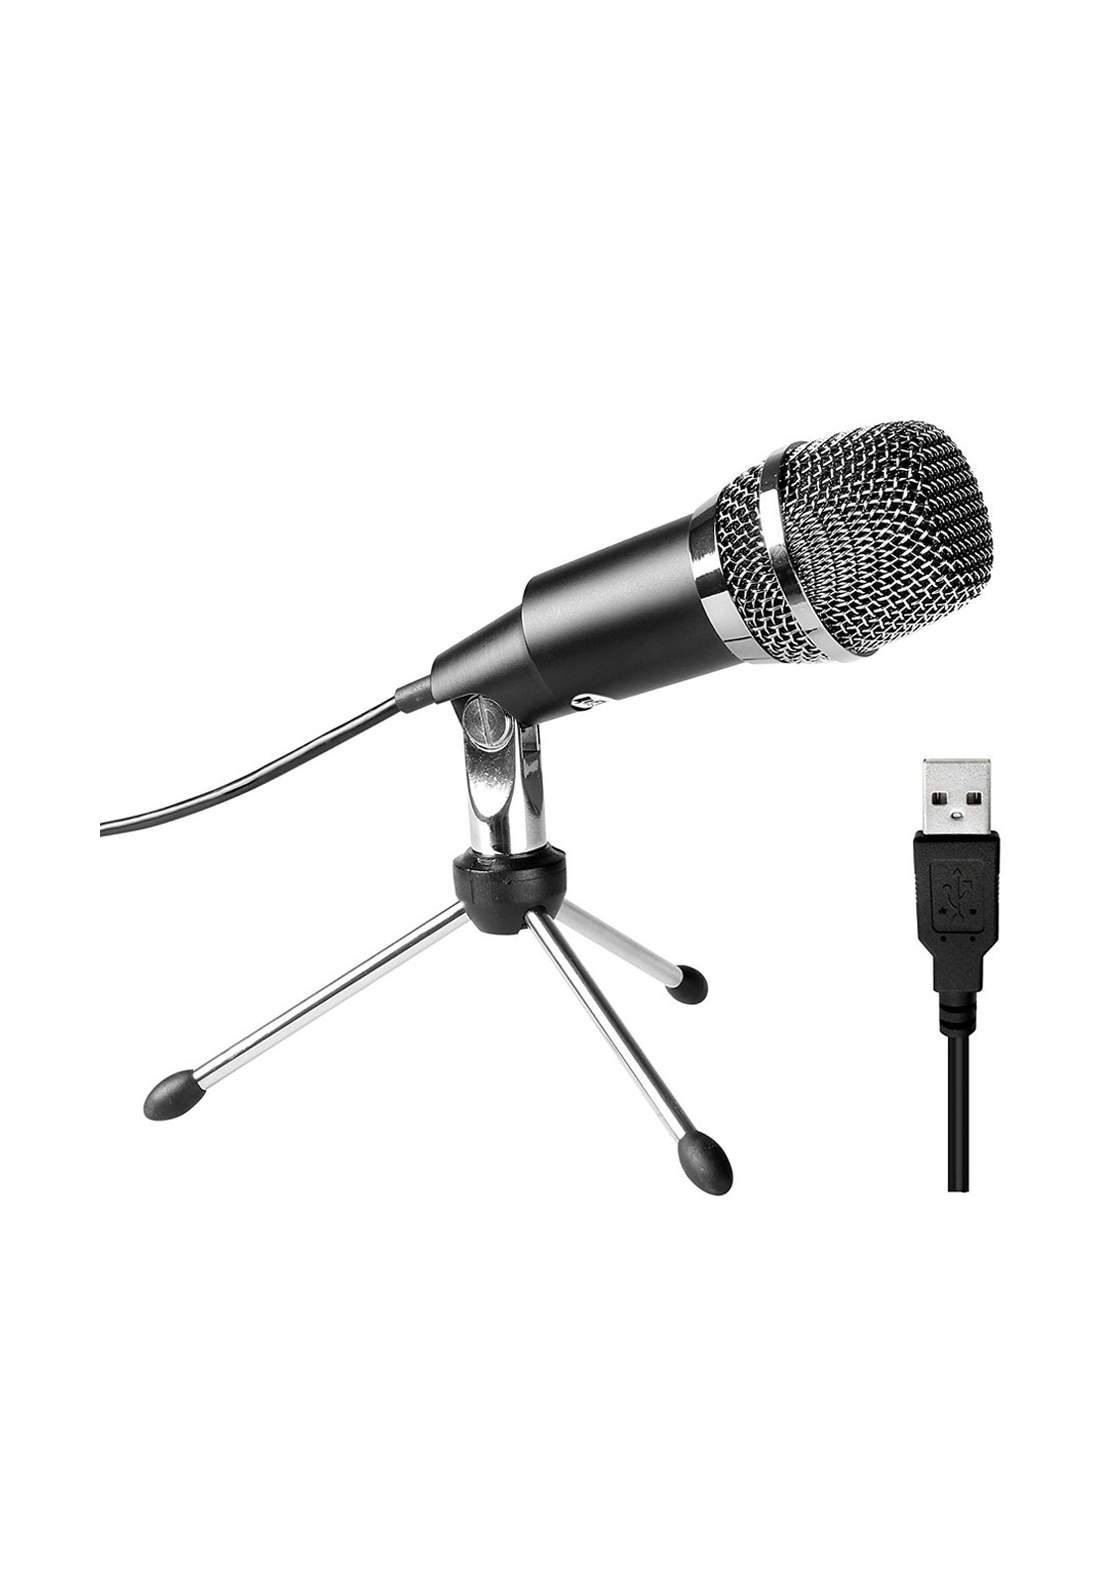 Fifine K668 USB Condenser Microphone - Black مايكروفون